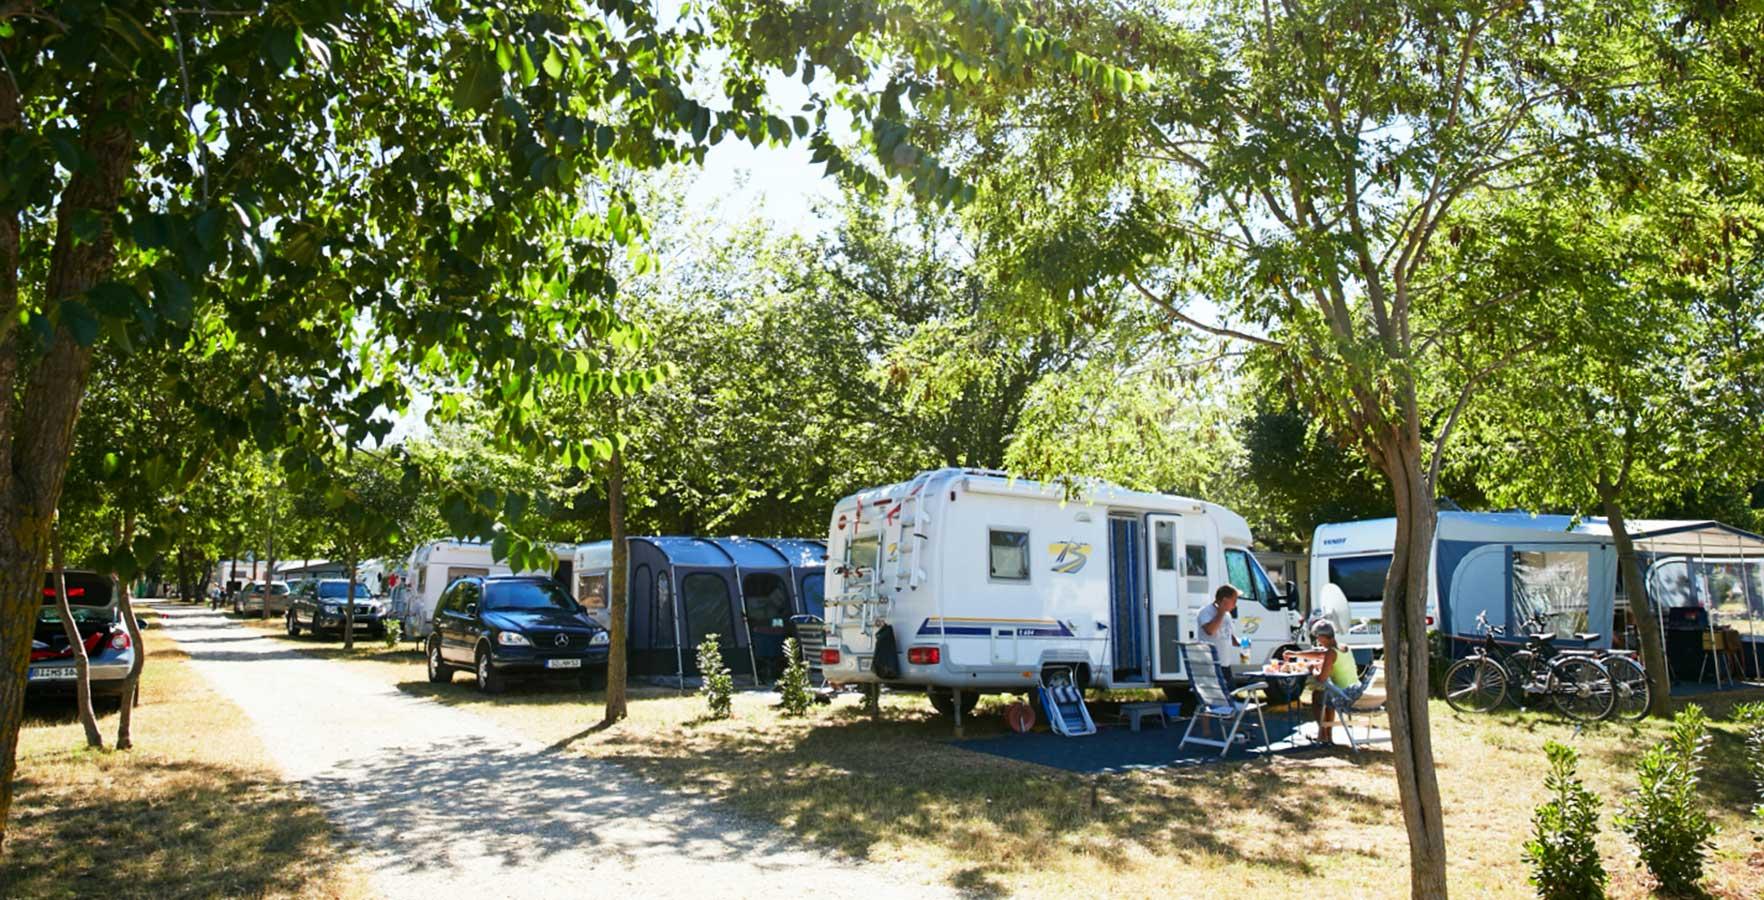 camping bi village kroatische camping vereniging. Black Bedroom Furniture Sets. Home Design Ideas